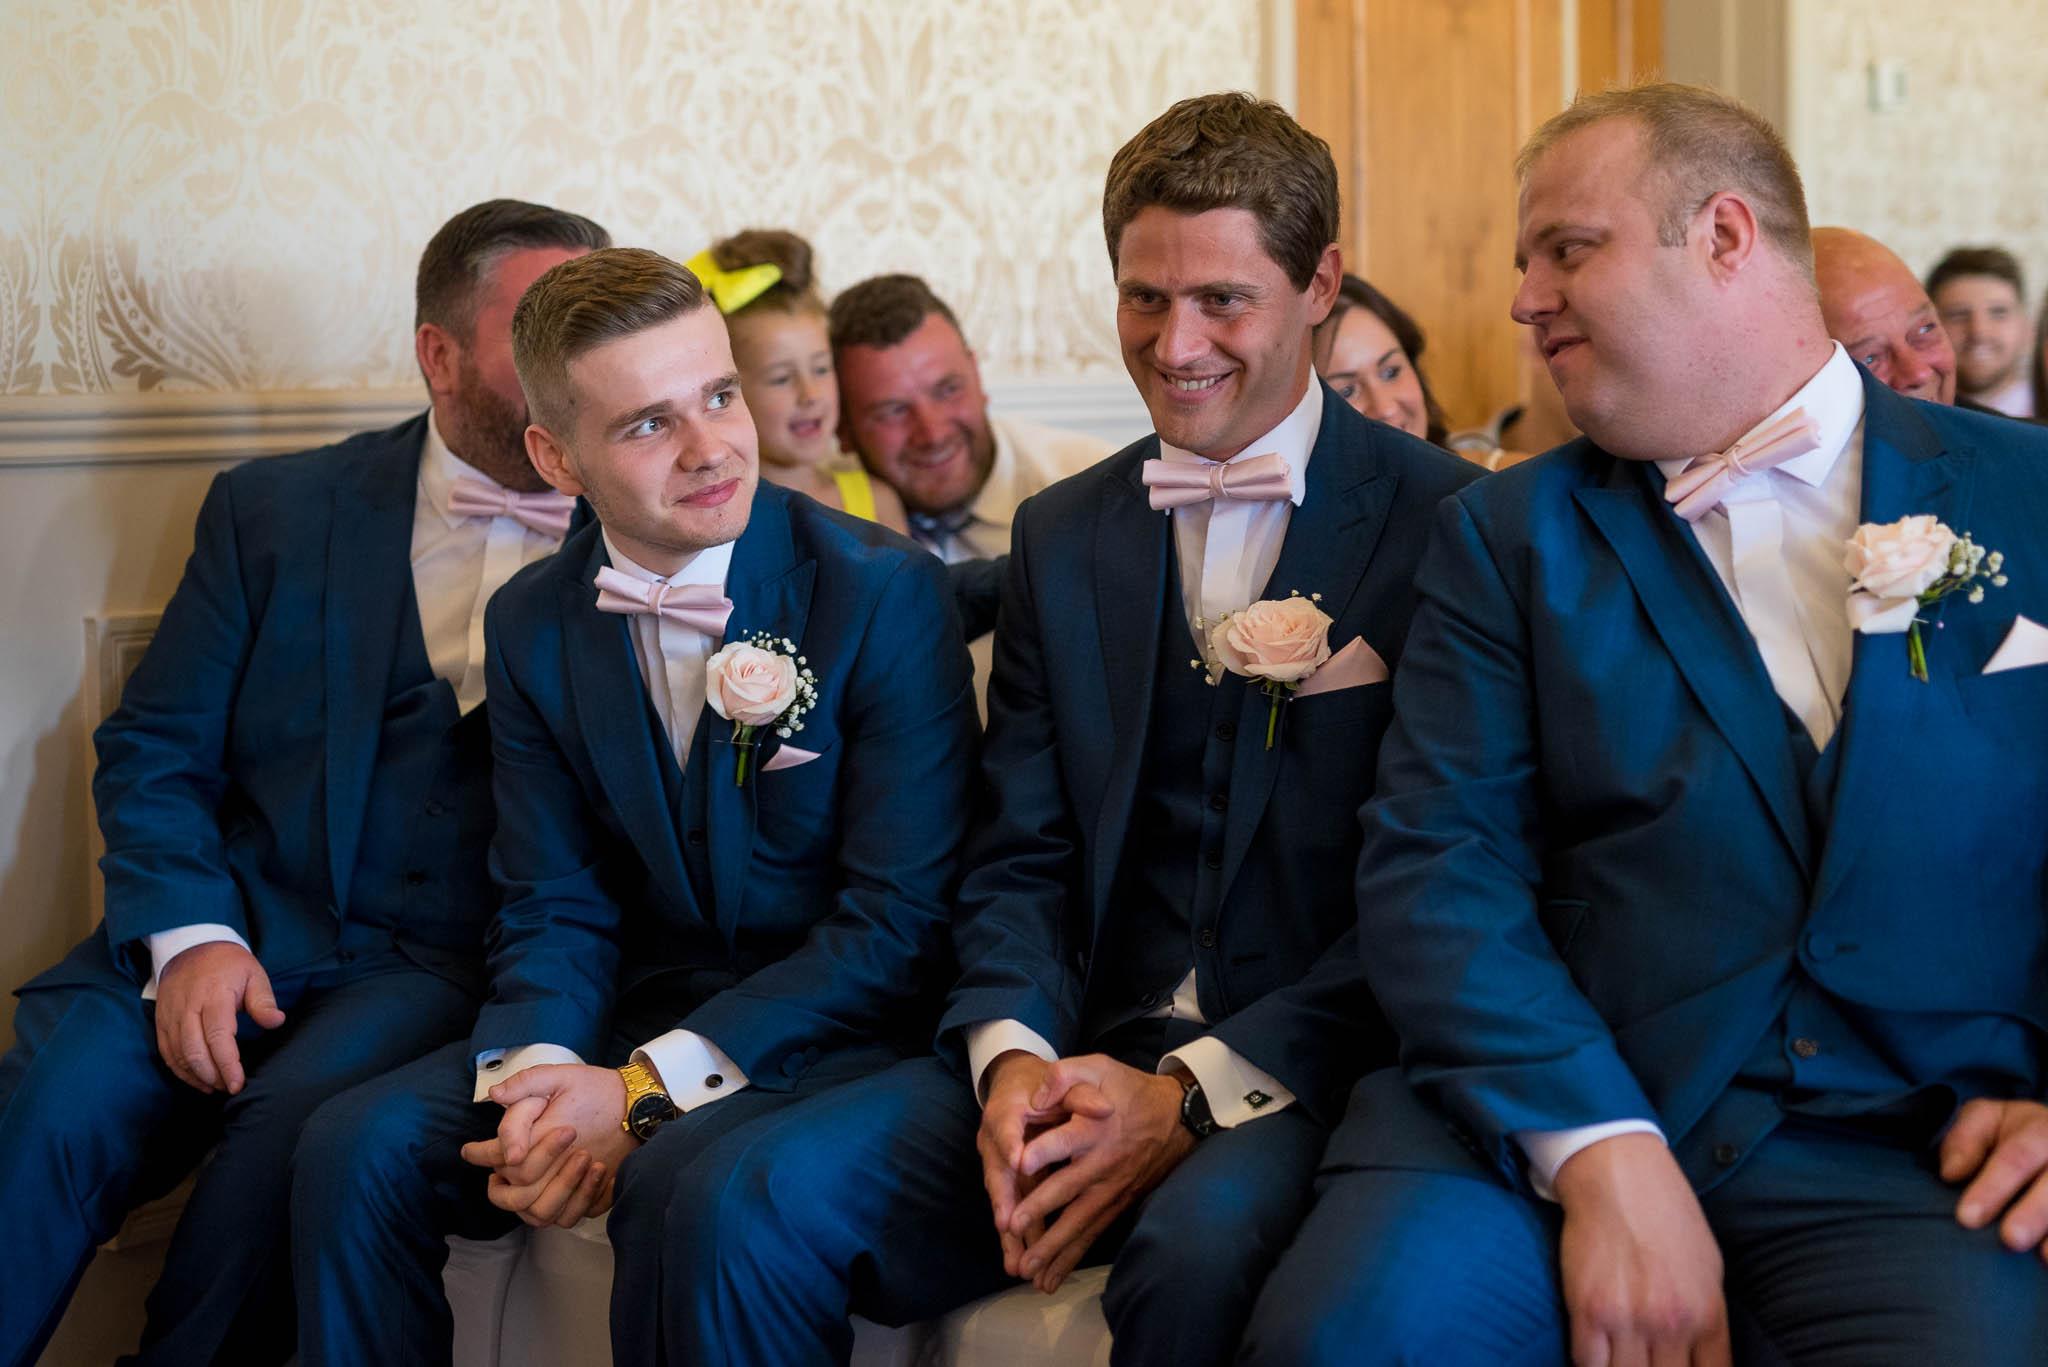 Darrington Golf Club Wedding Photographer72.jpg